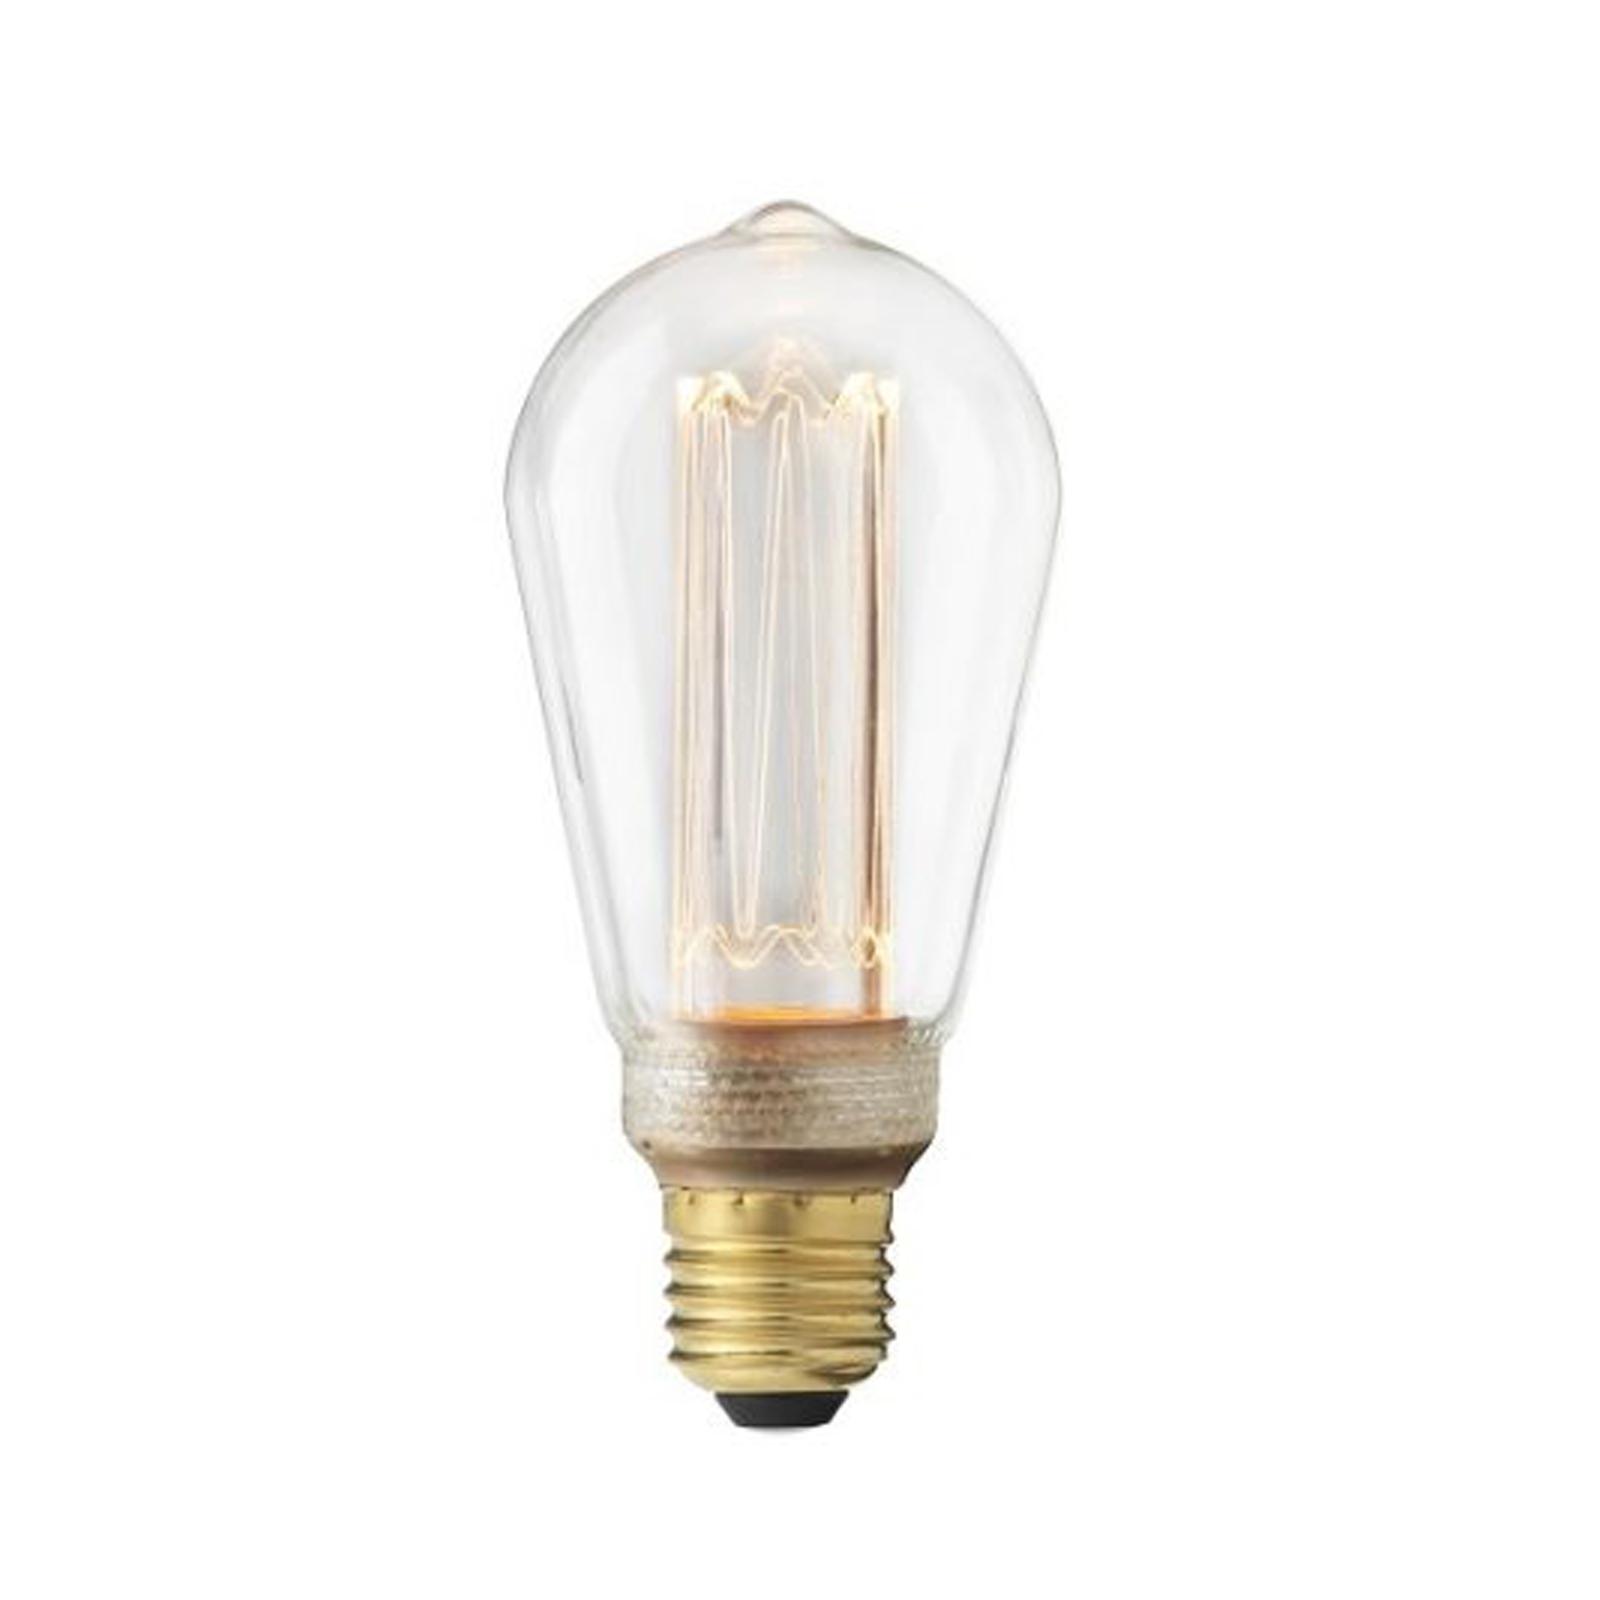 LED-lampa Edison E14, rökfärgad